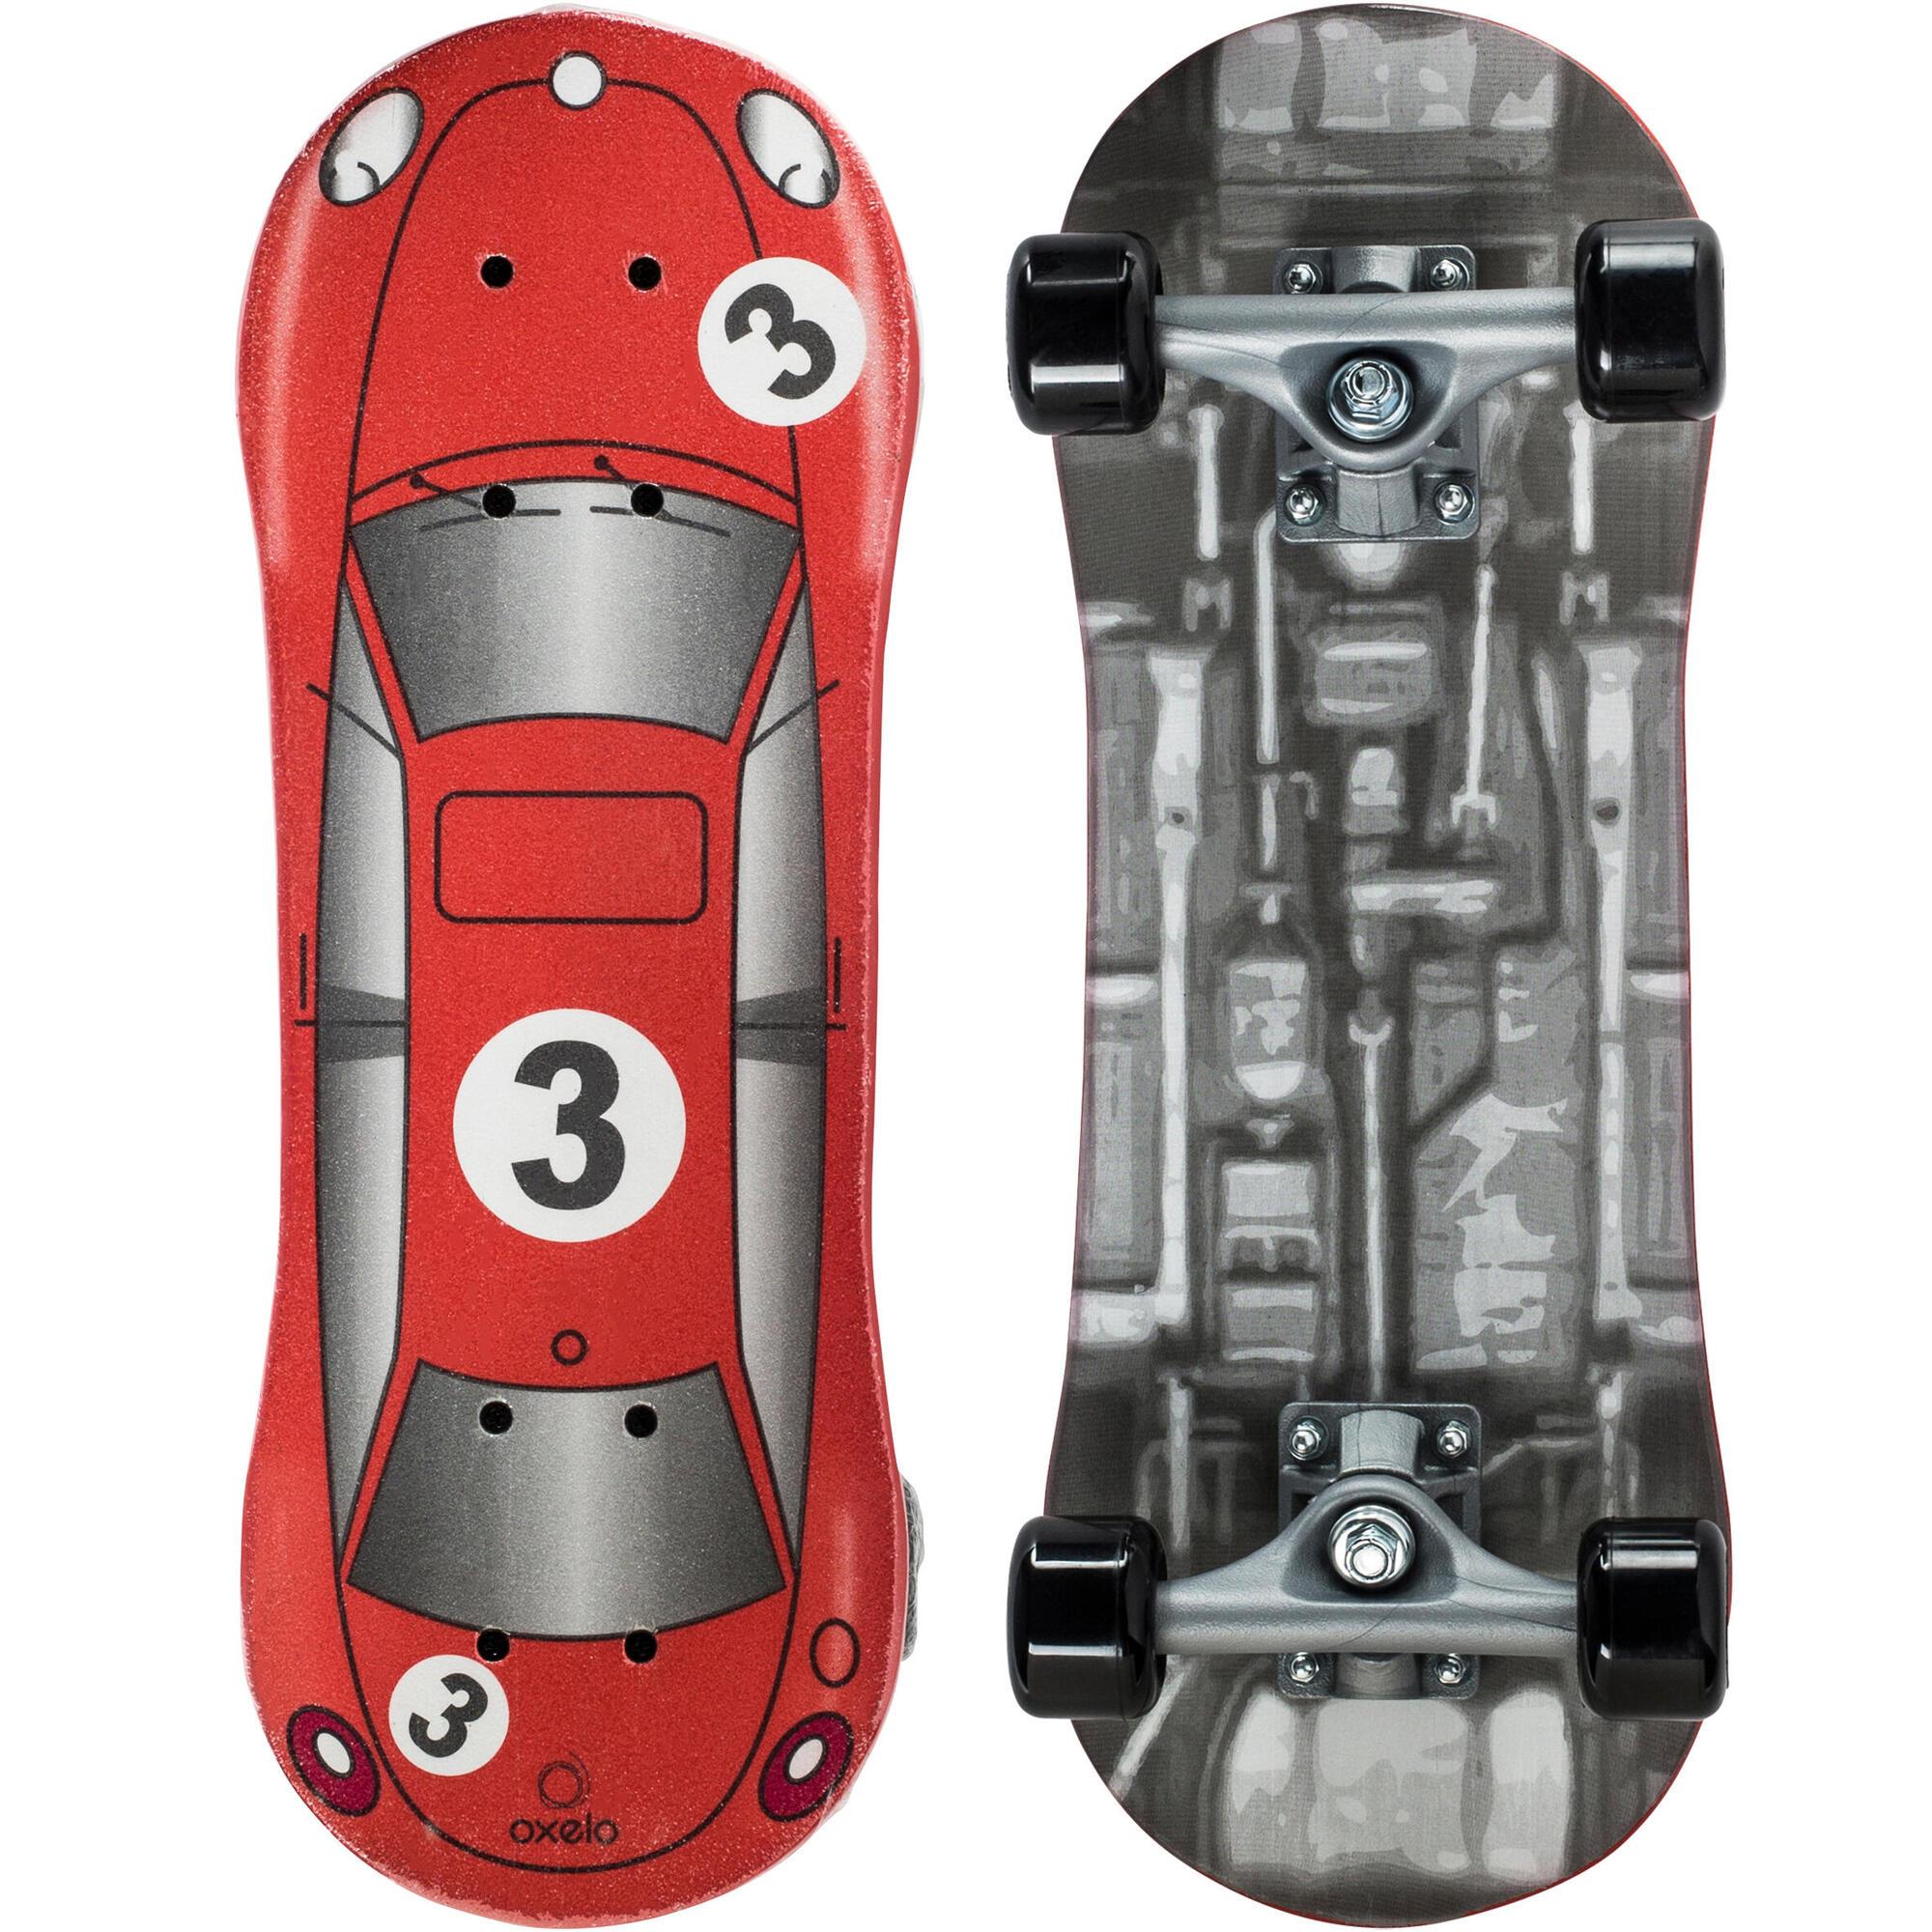 Play 1 Red Racer Kids Skateboard Oxelo